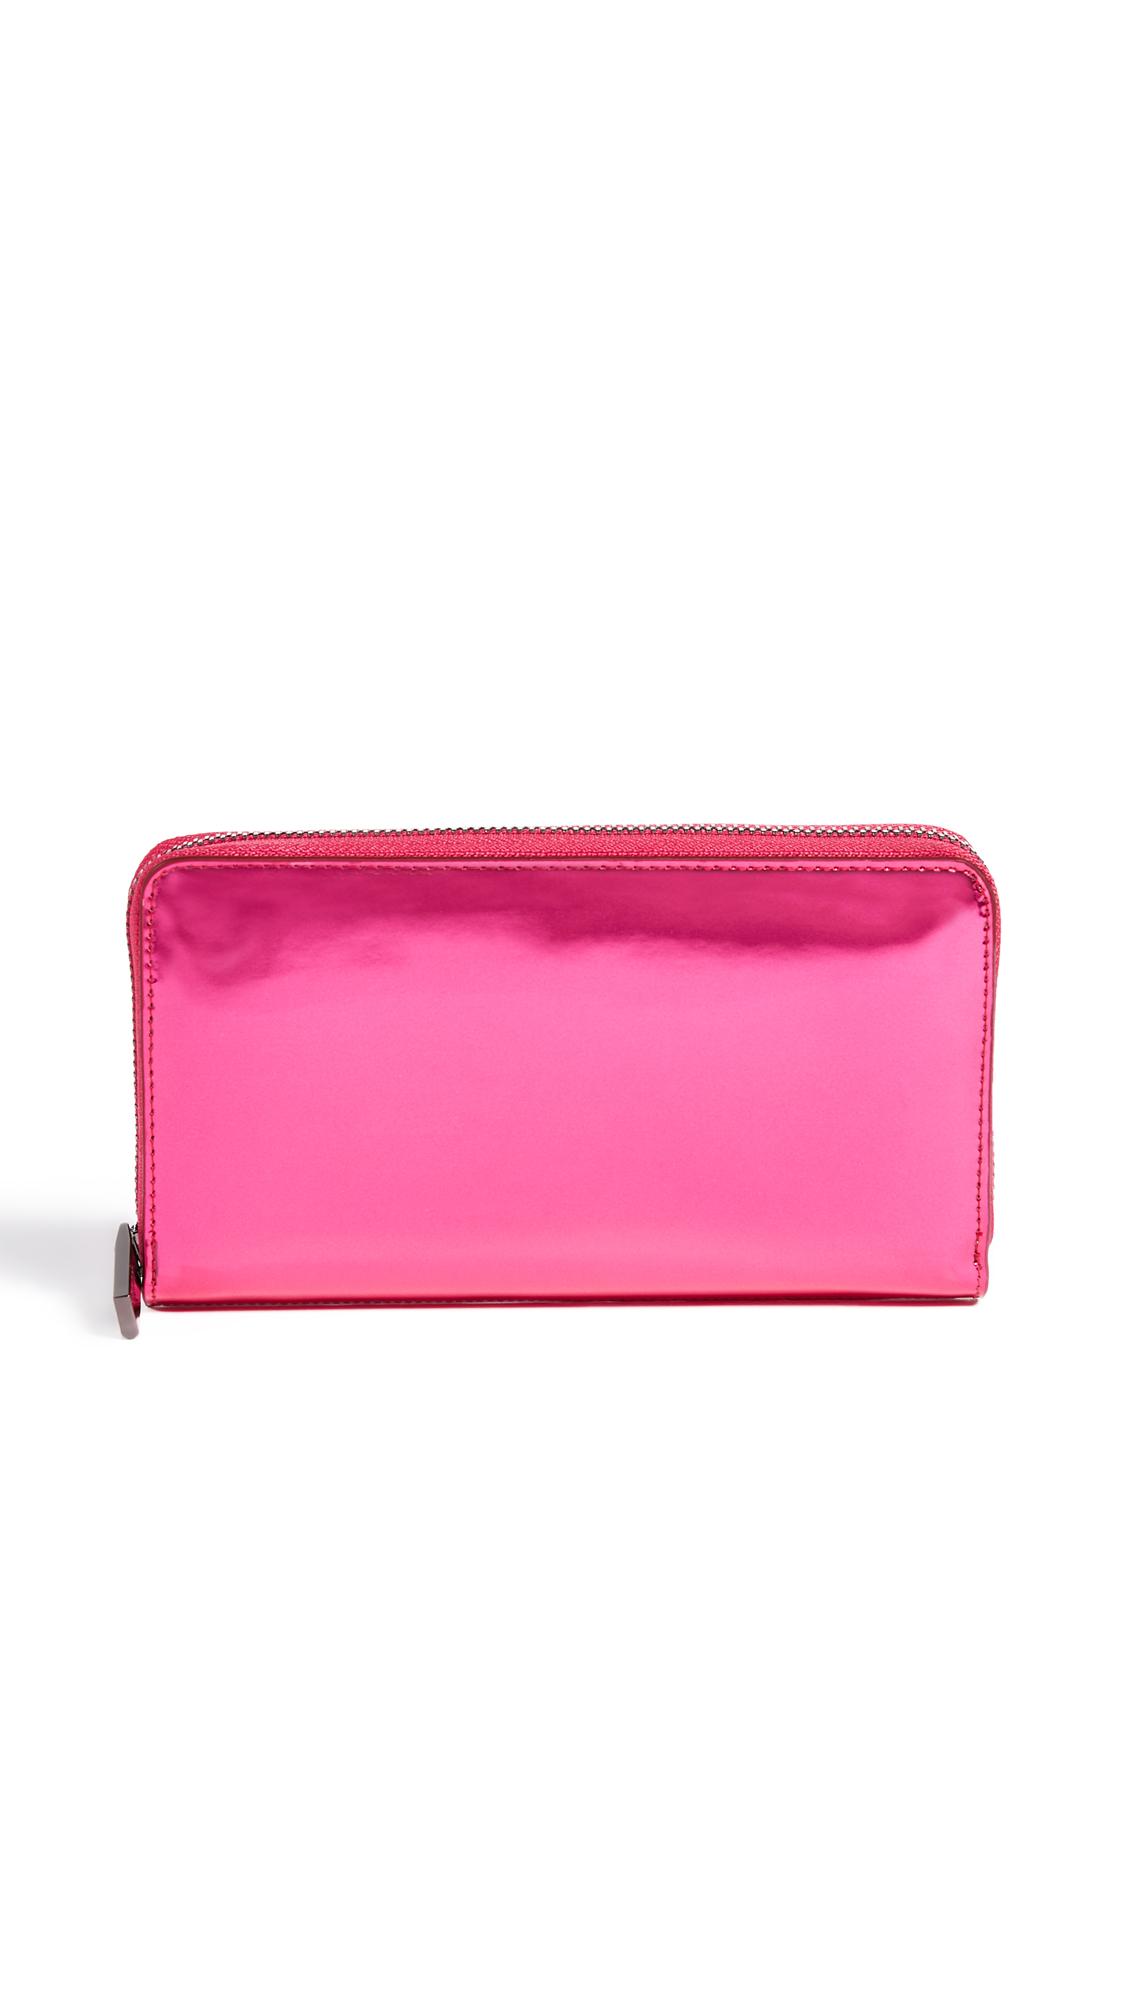 Deux Lux Skyline Wallet - Pink